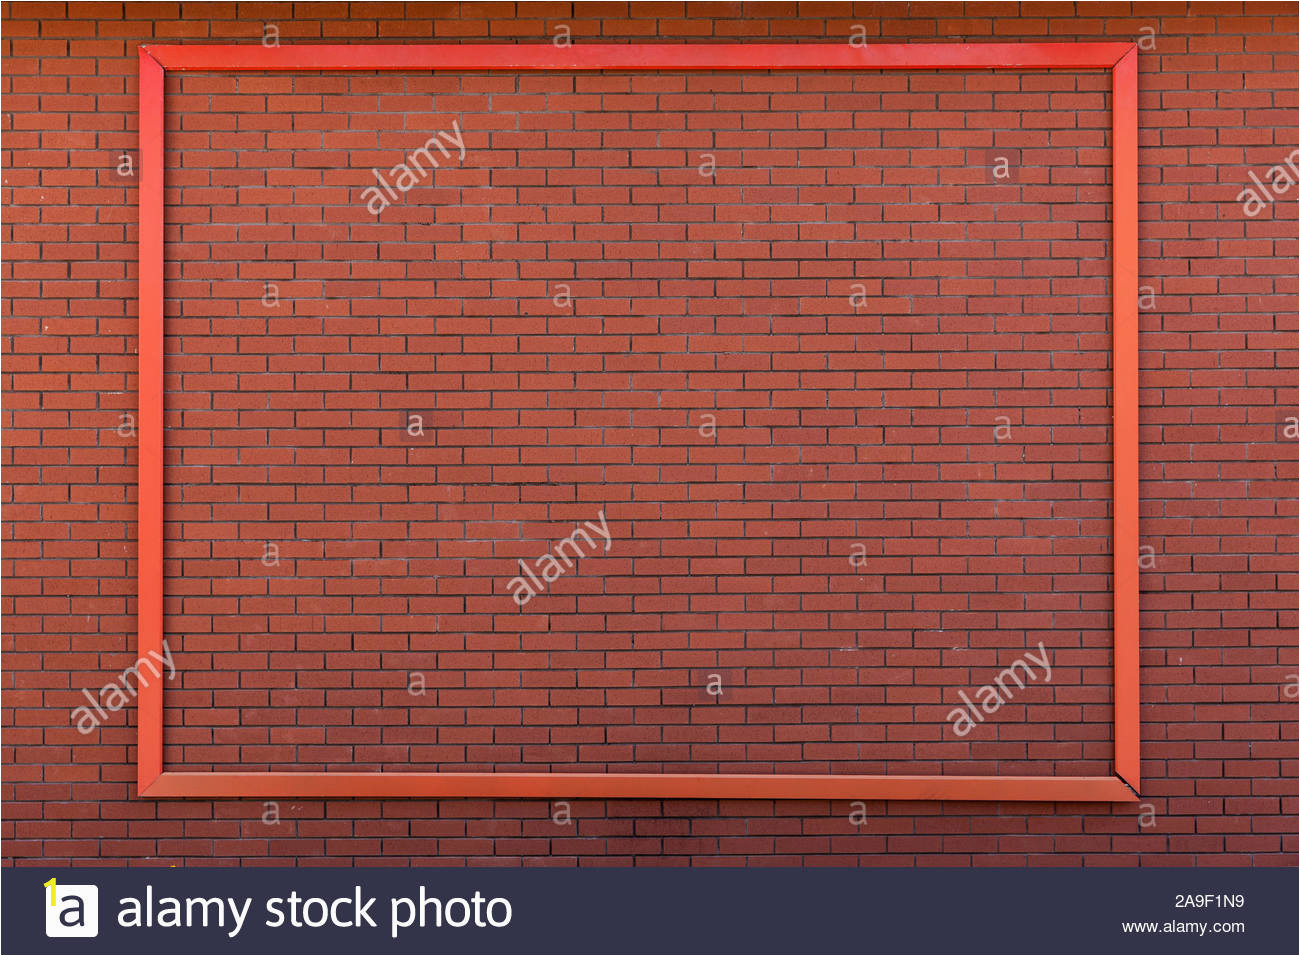 Brick Wall Mural Mockup Poster Frame On Brick Wall Stock Alamy